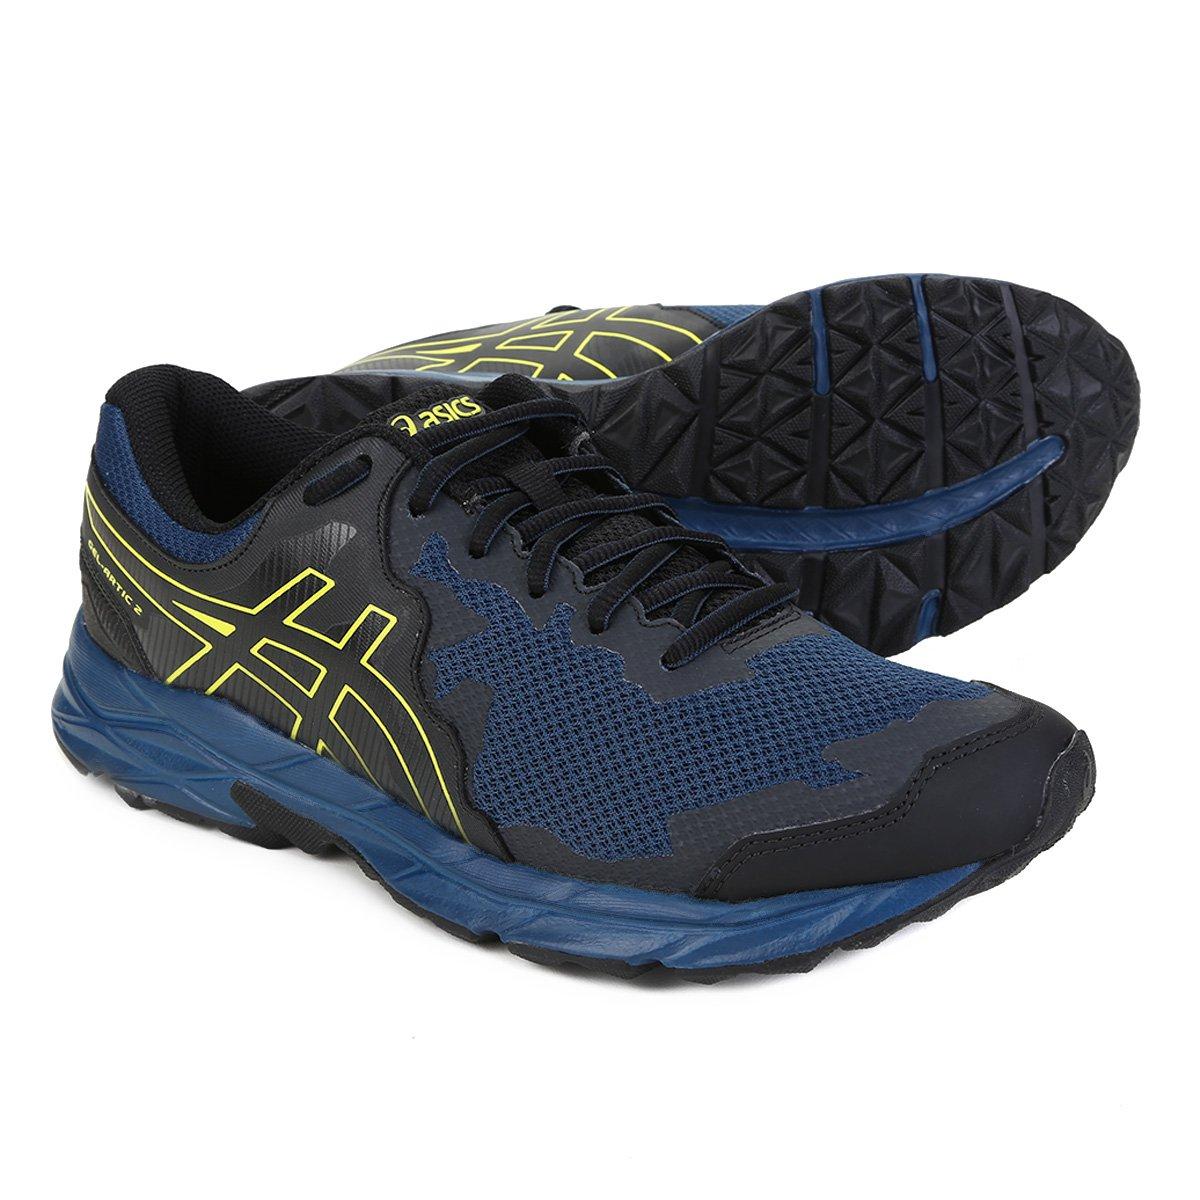 mizuno mens running shoes size 11 youtube problem pdf